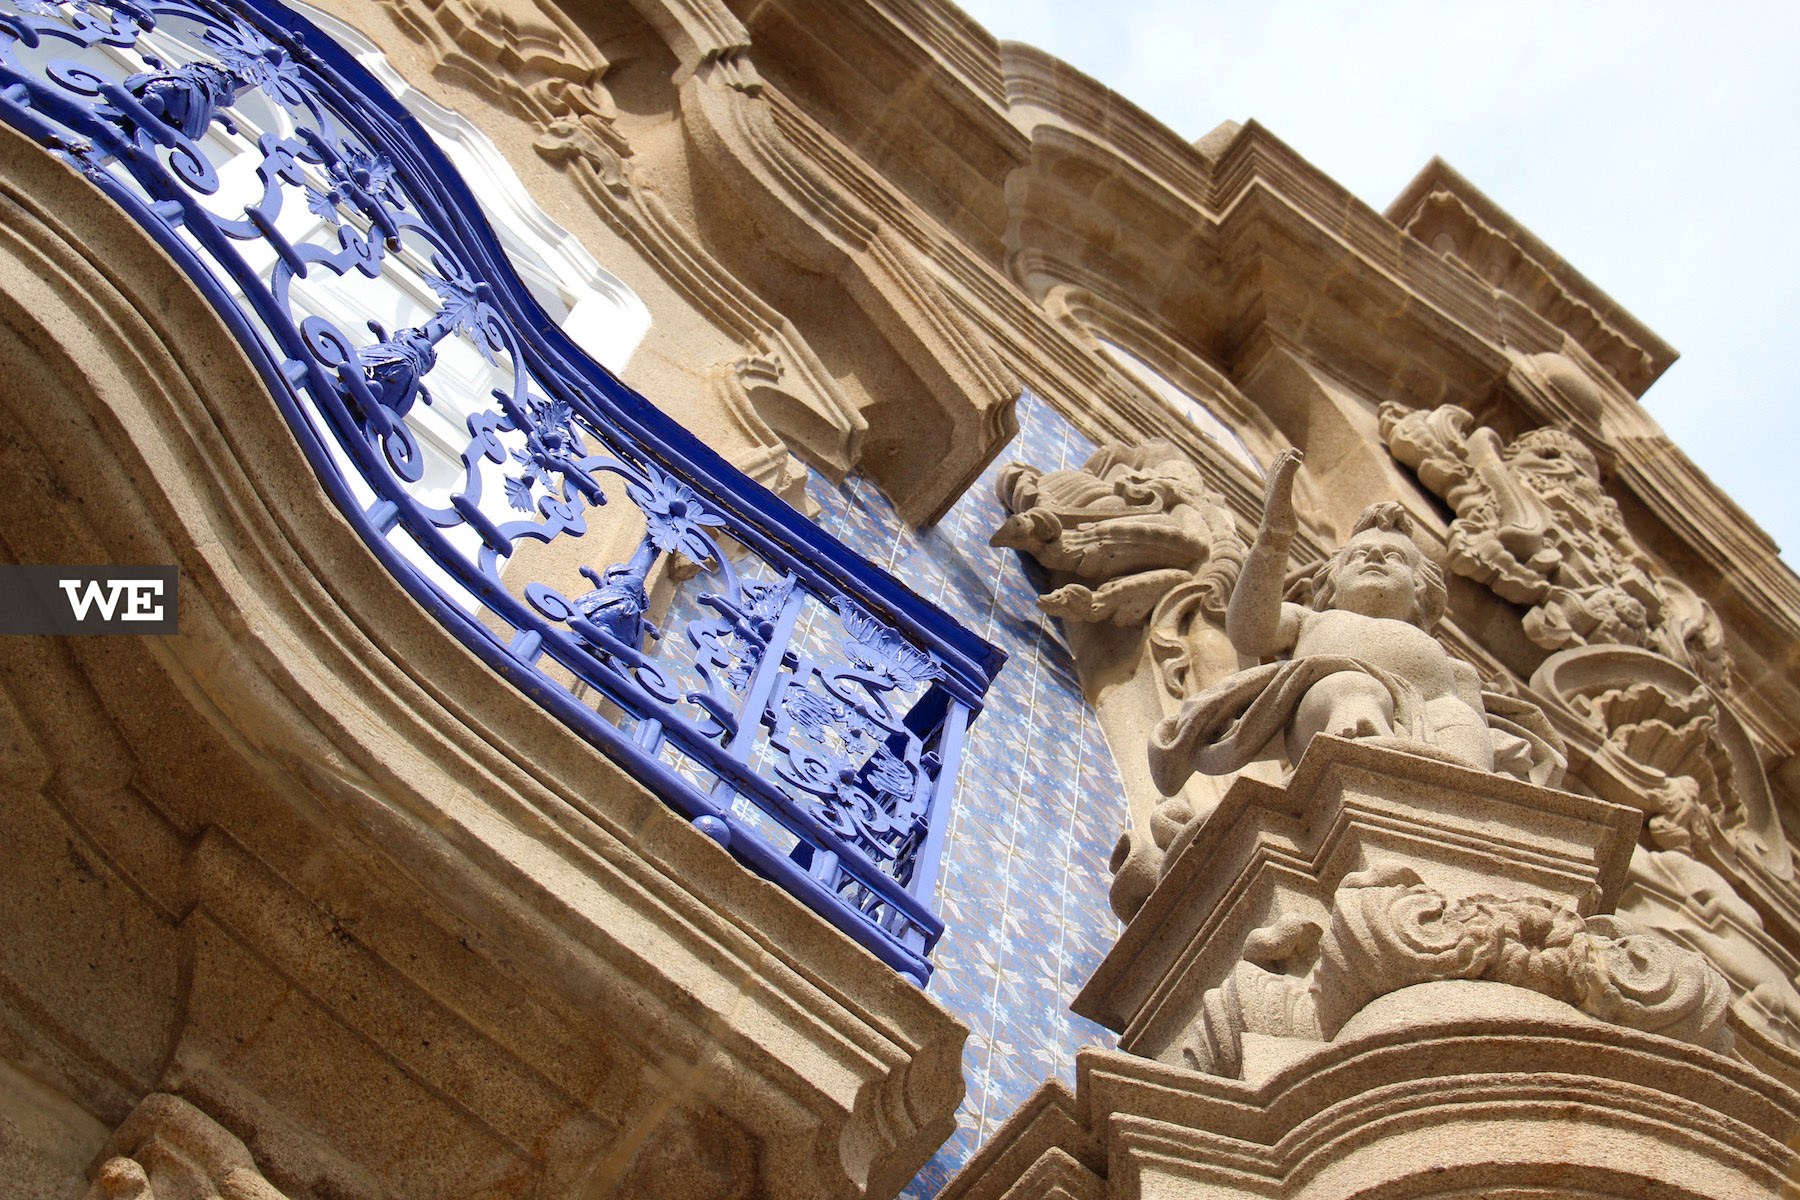 we-braga-palacio-raio-34-roteiro-barroco